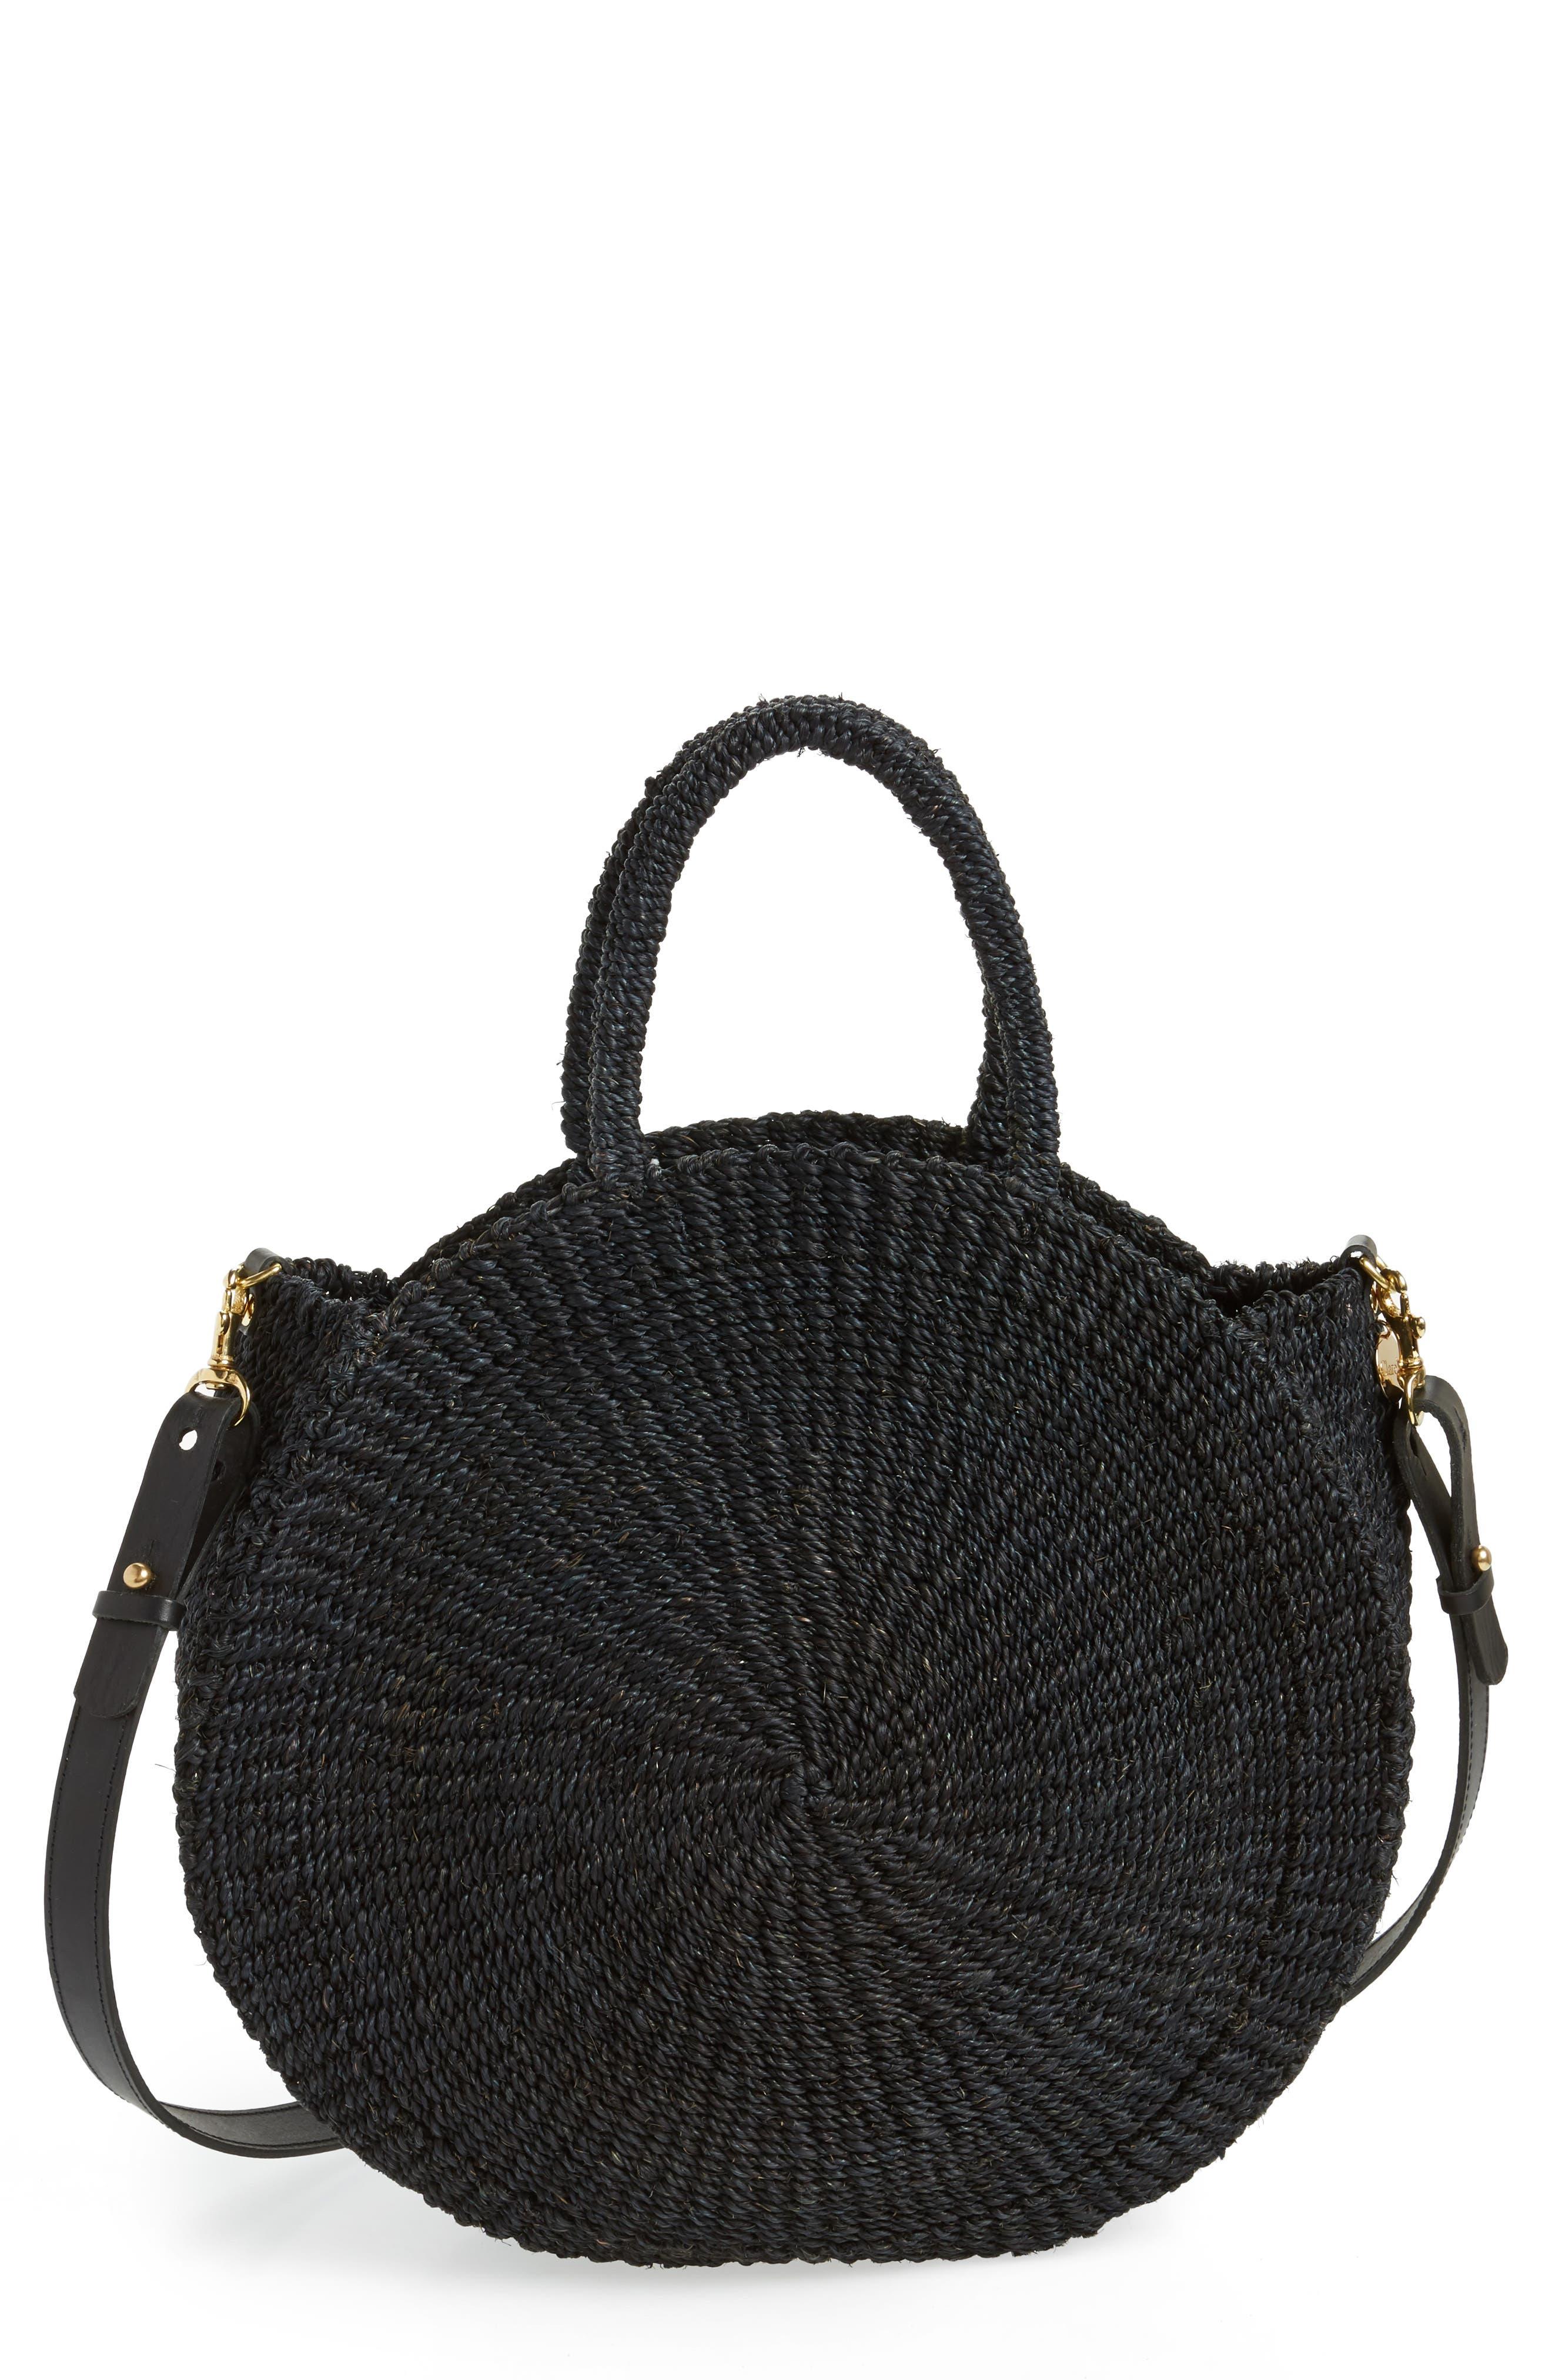 Alice Woven Sisal Straw Bag,                         Main,                         color, BLACK WOVEN